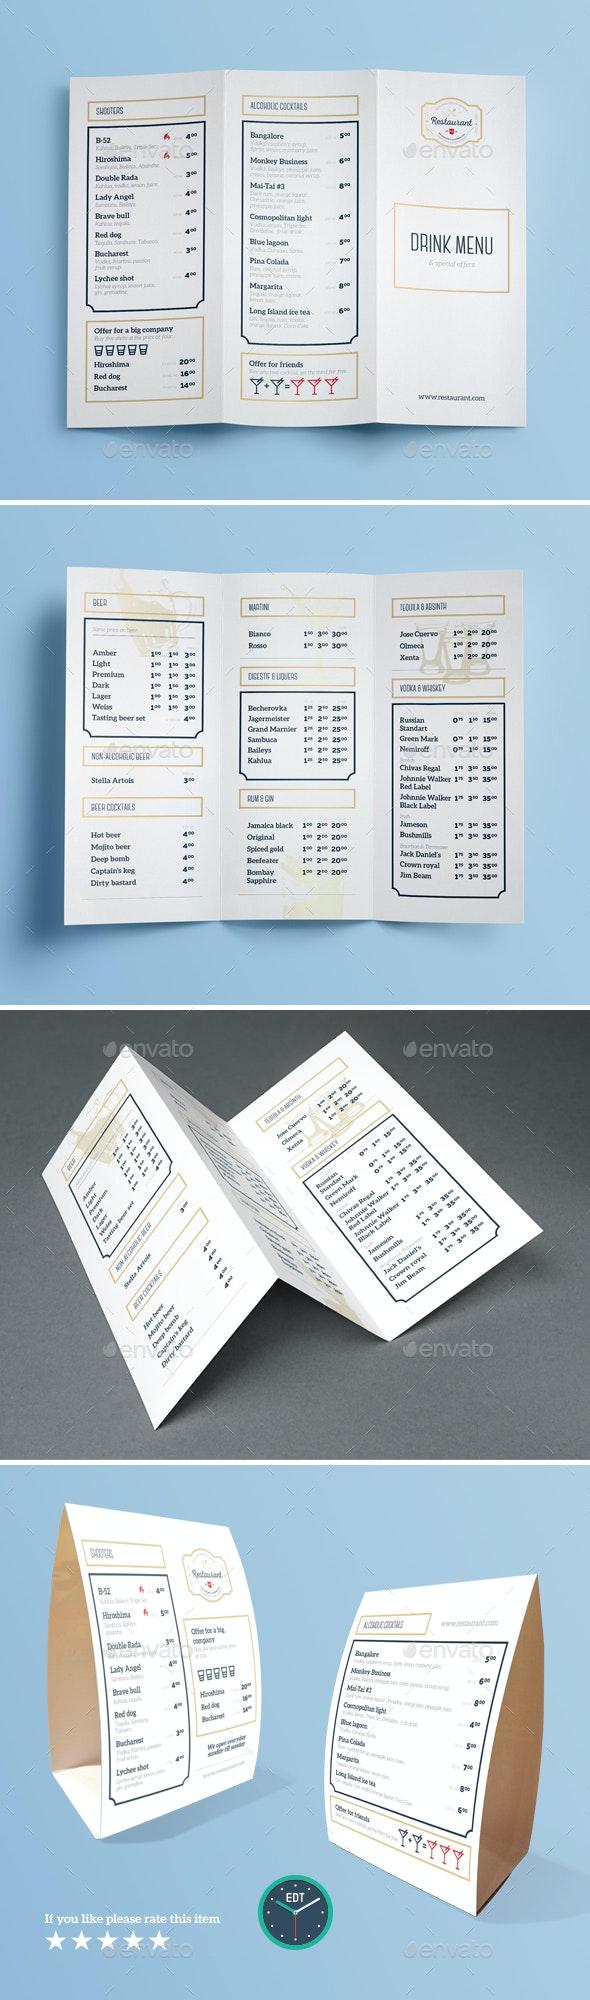 Drink Menu Templates - Food Menus Print Templates